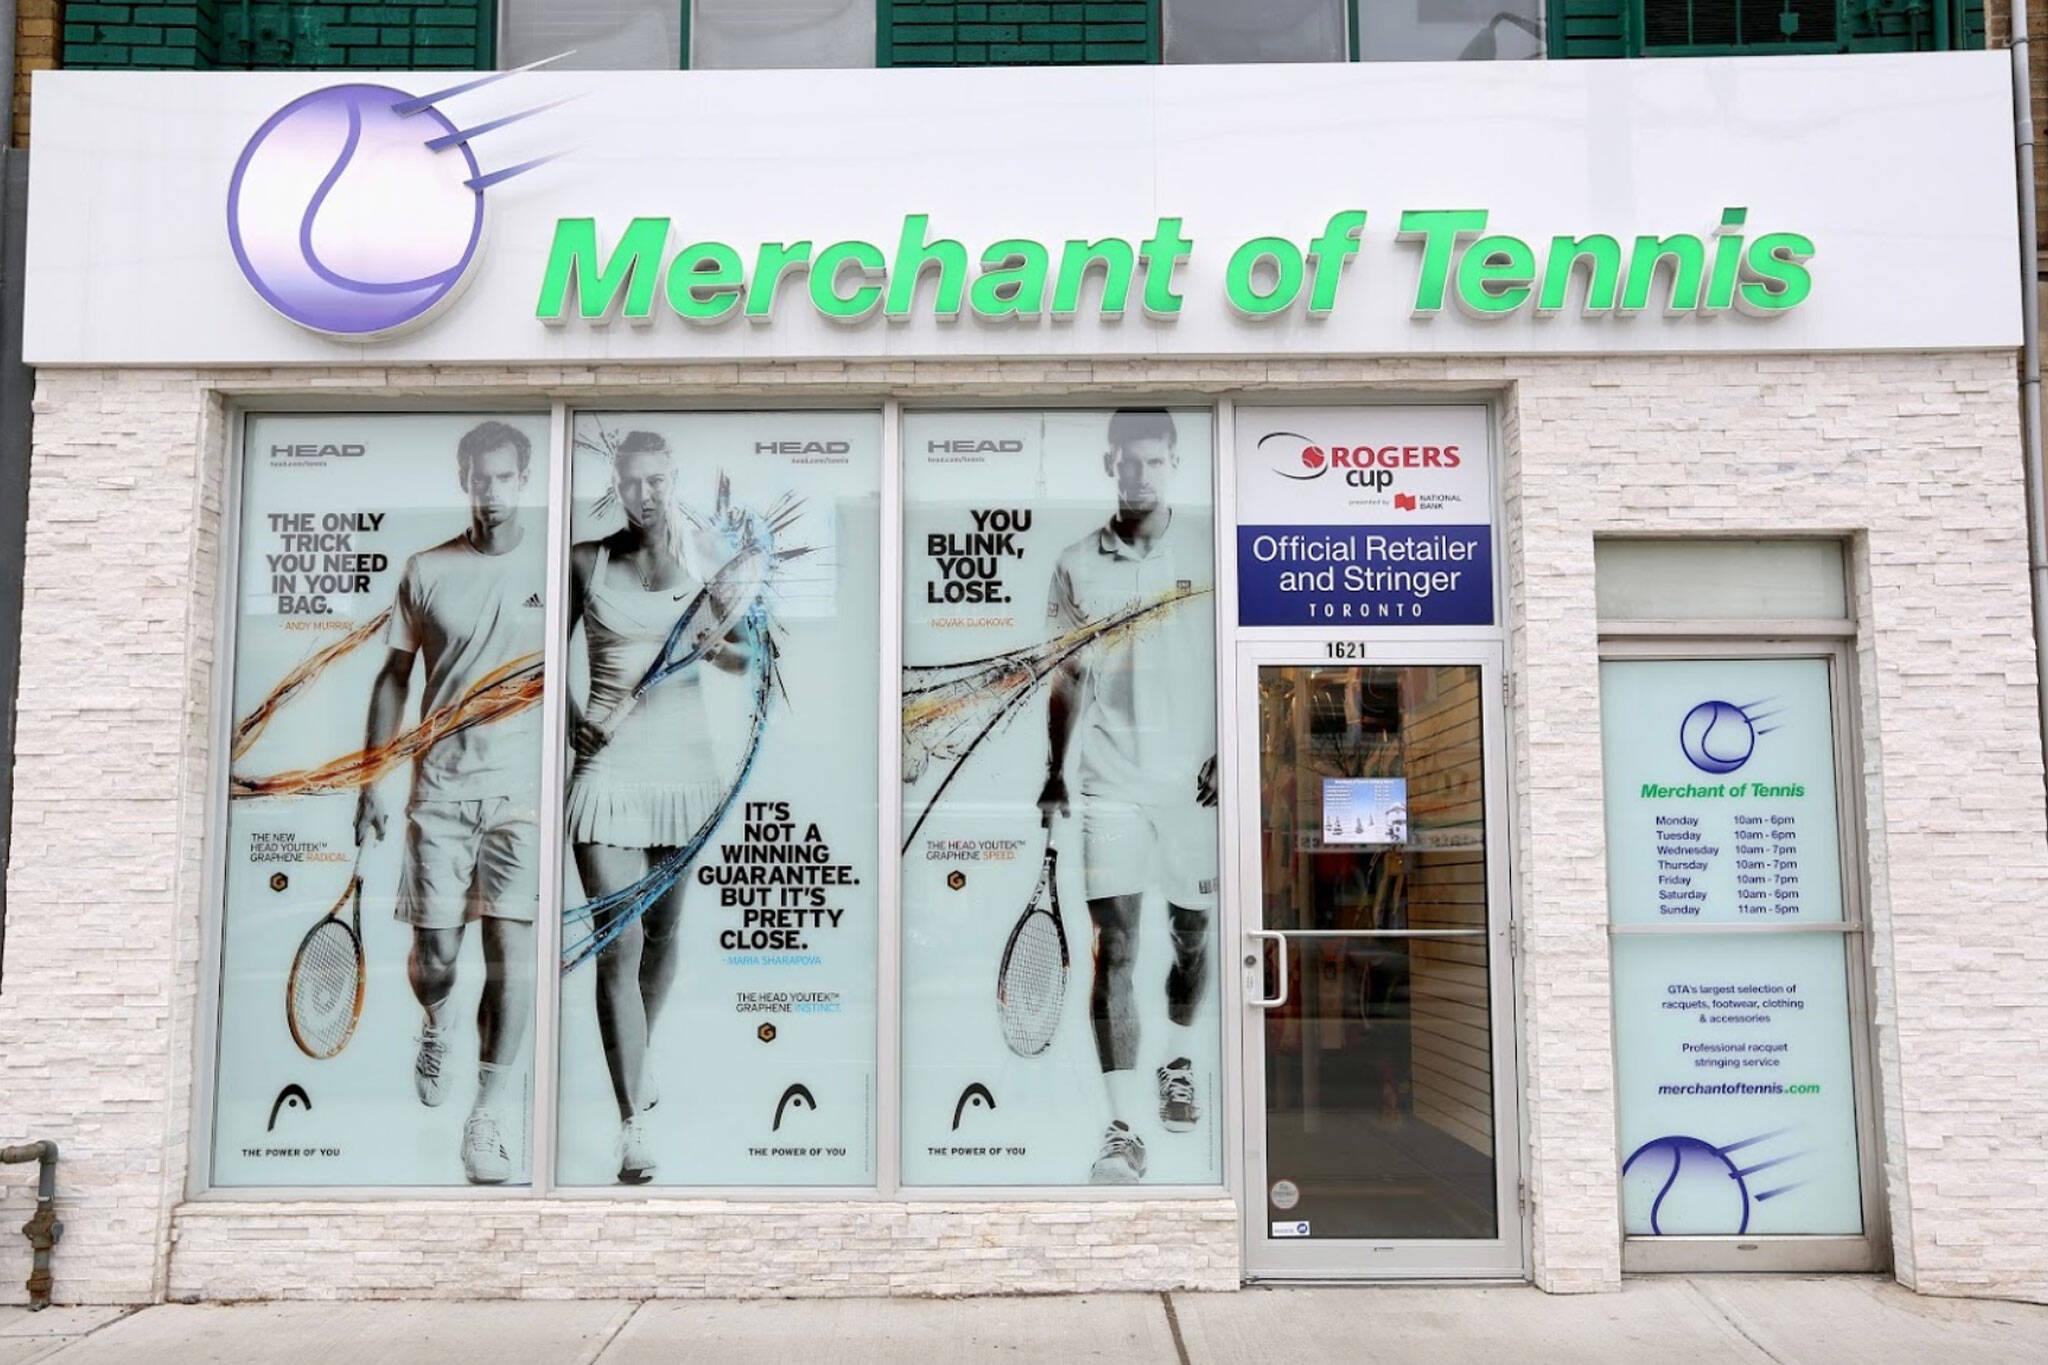 Merchant of Tennis Toronto